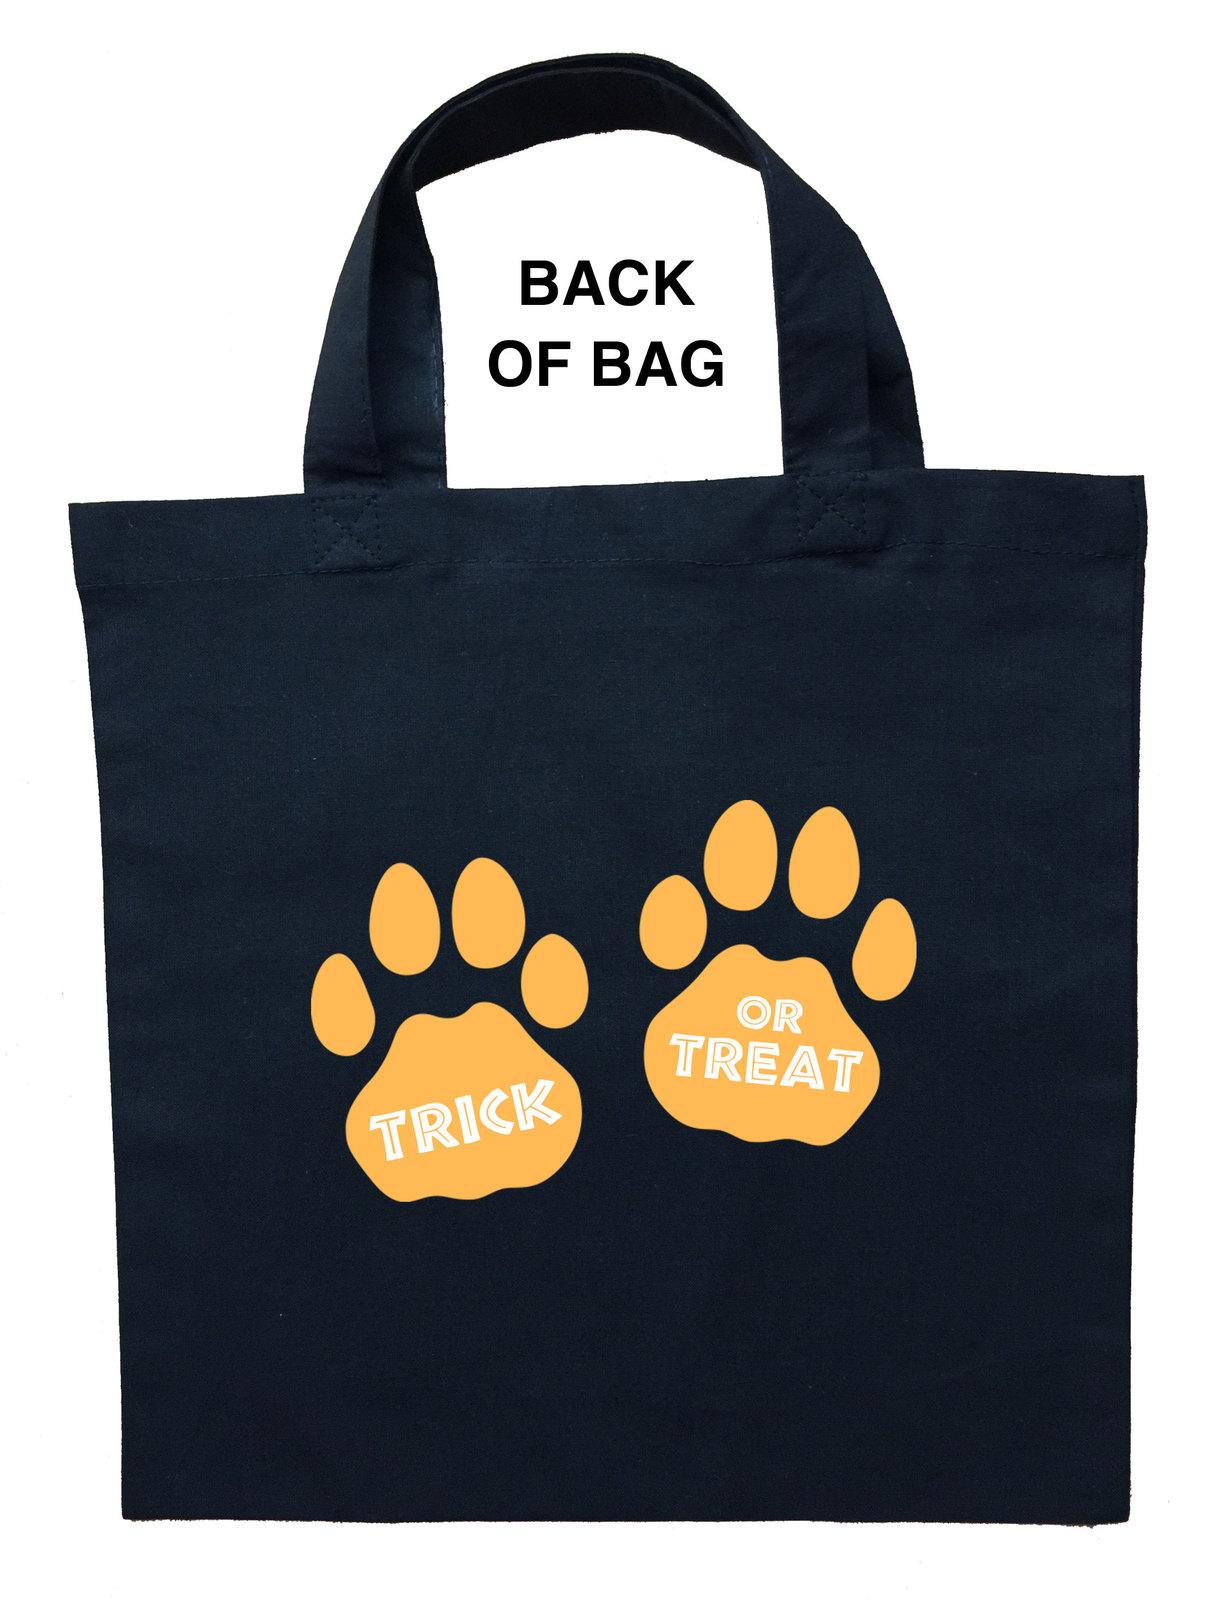 Lion Trick or Treat Bag, Baby Lion Halloween Bag, Lion Loot Bag, Lion Candy Bag